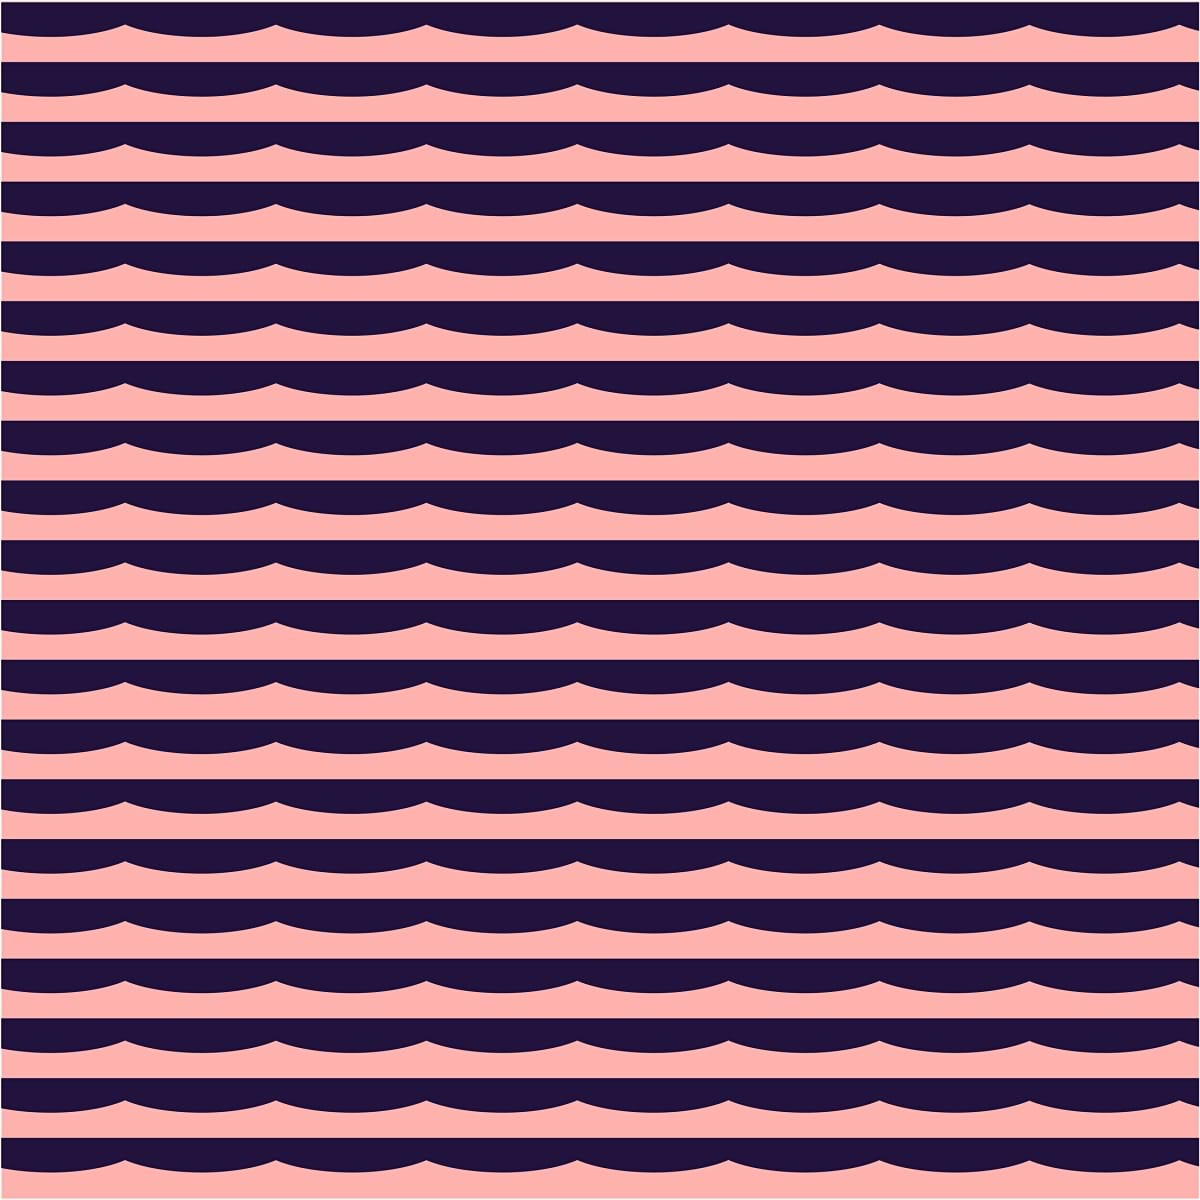 TH_Wave_Pattern_PinkNavy_AW.jpg